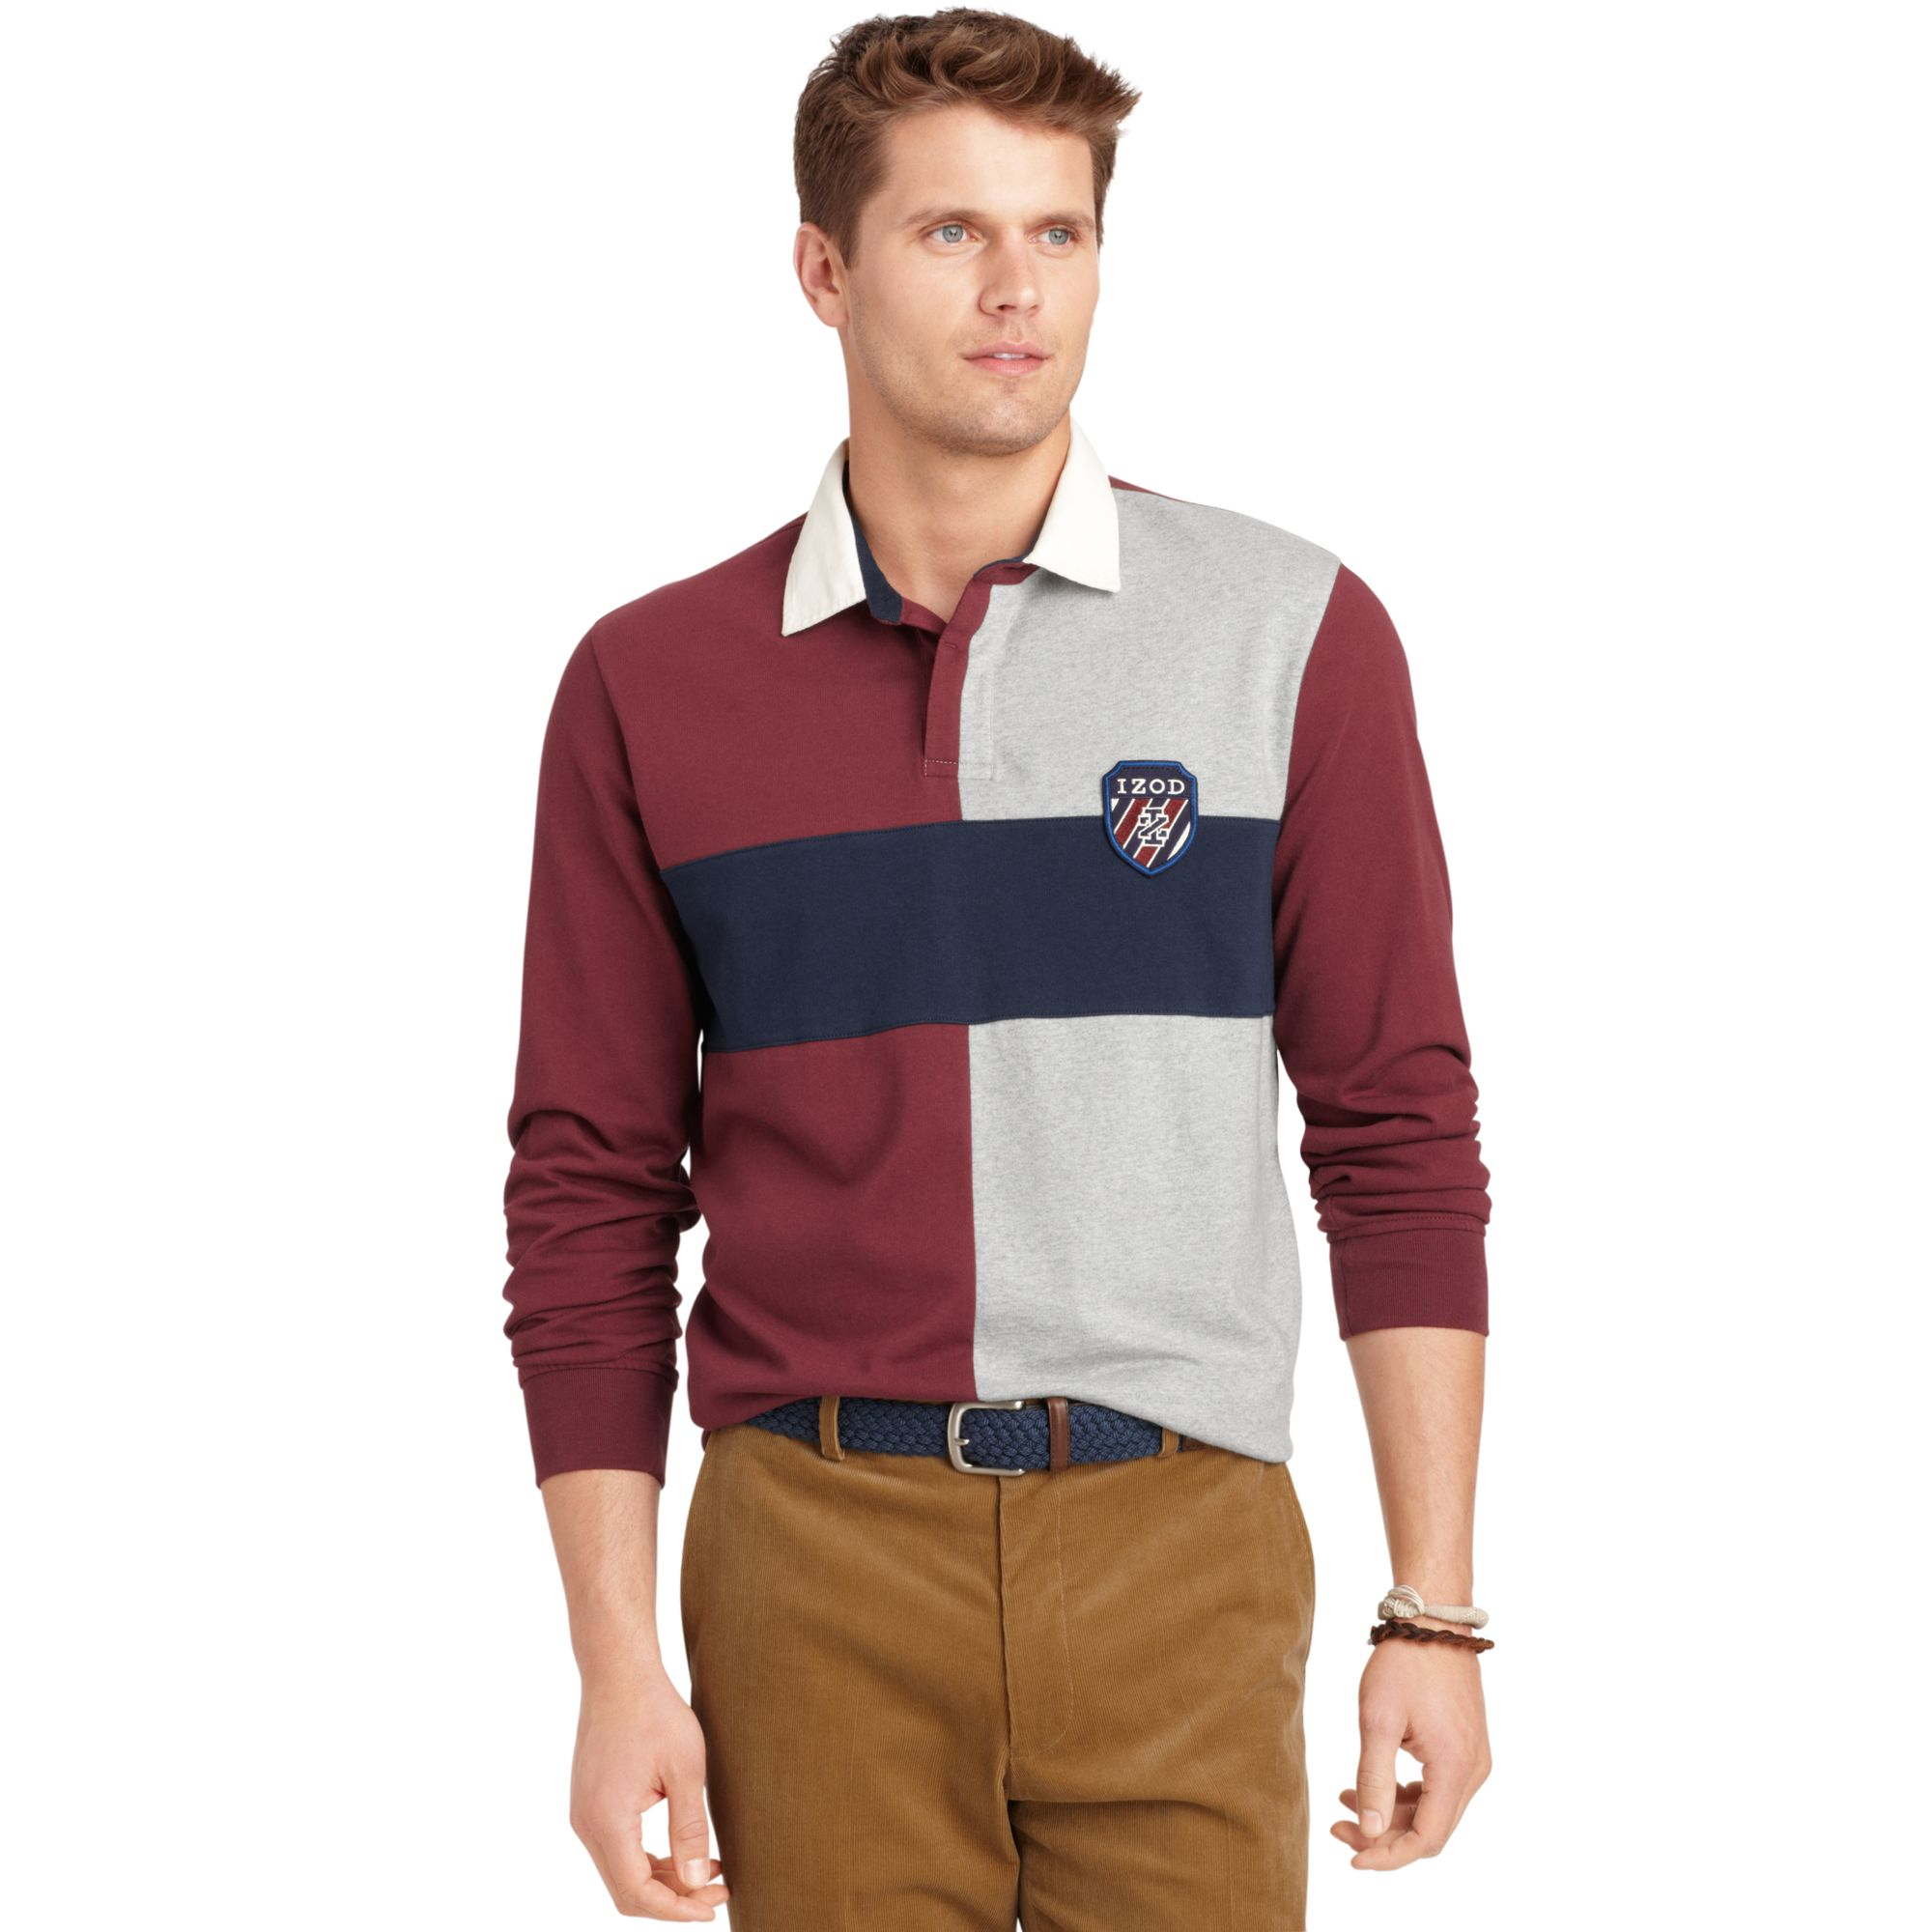 99fbd9685d6af Izod Polo Shirts Cheap - BCD Tofu House